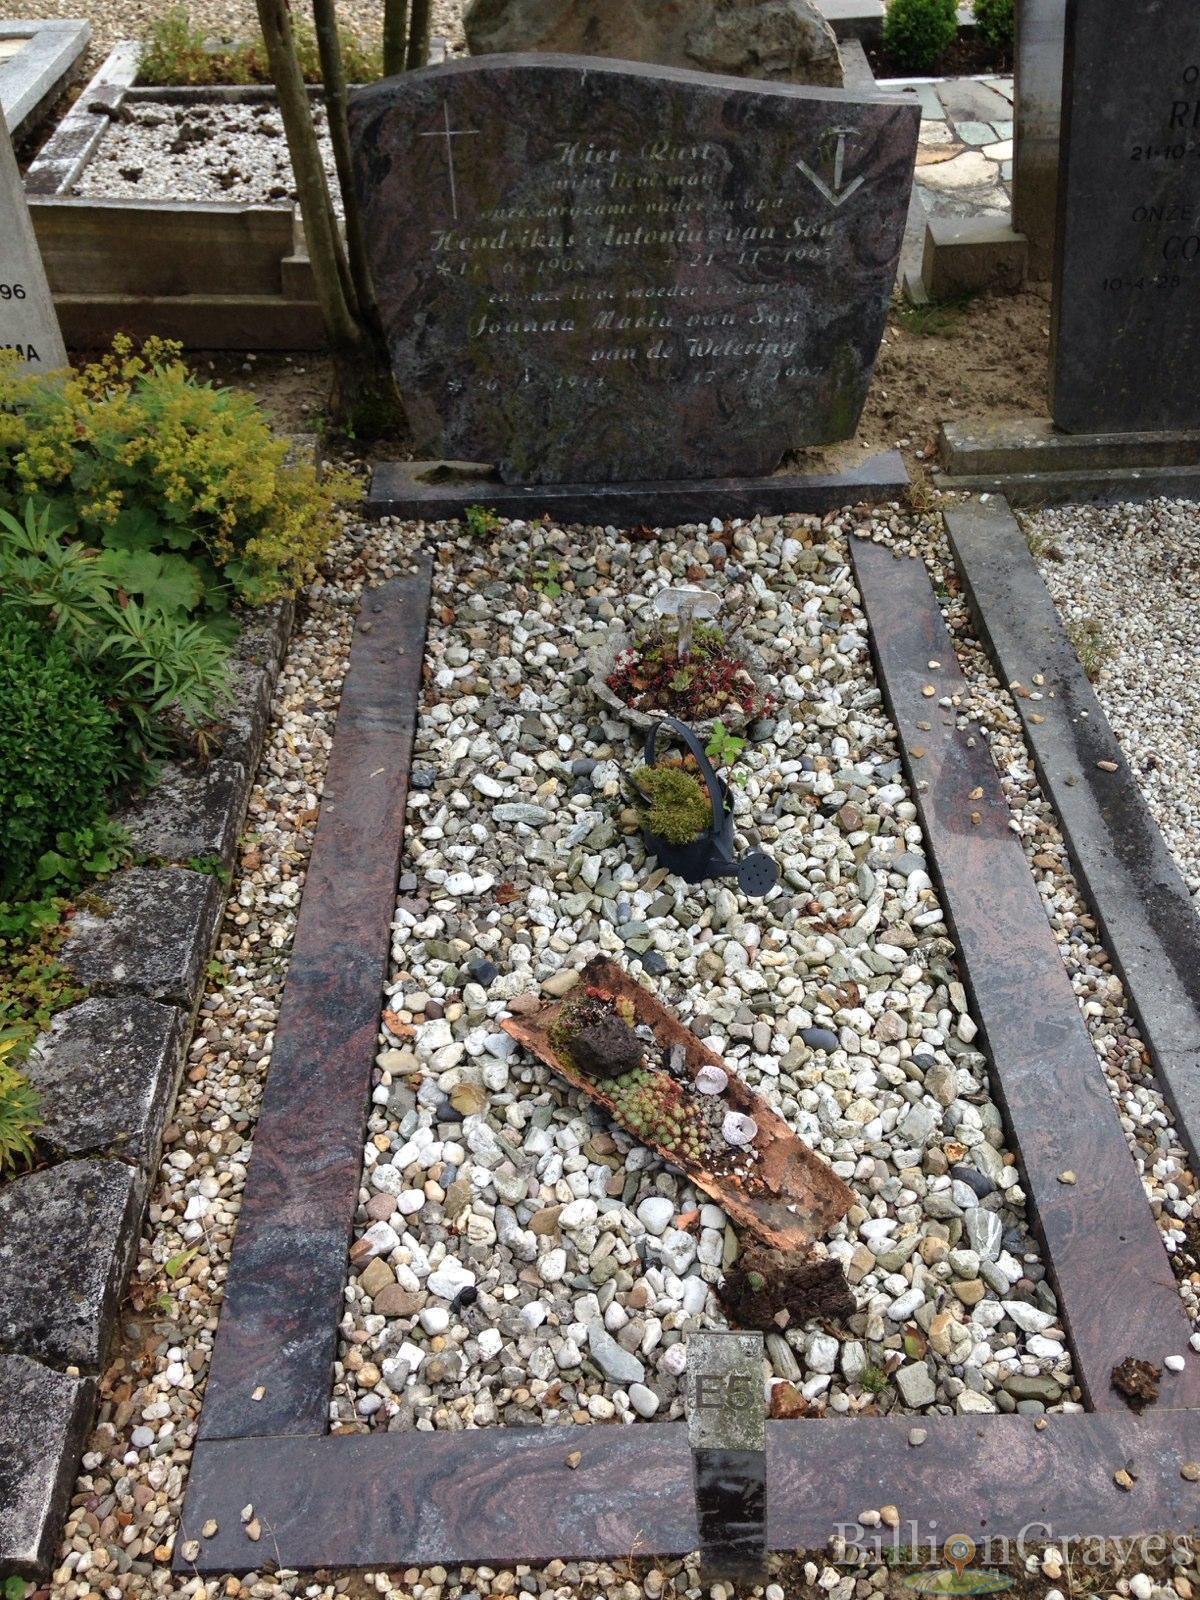 Van graves